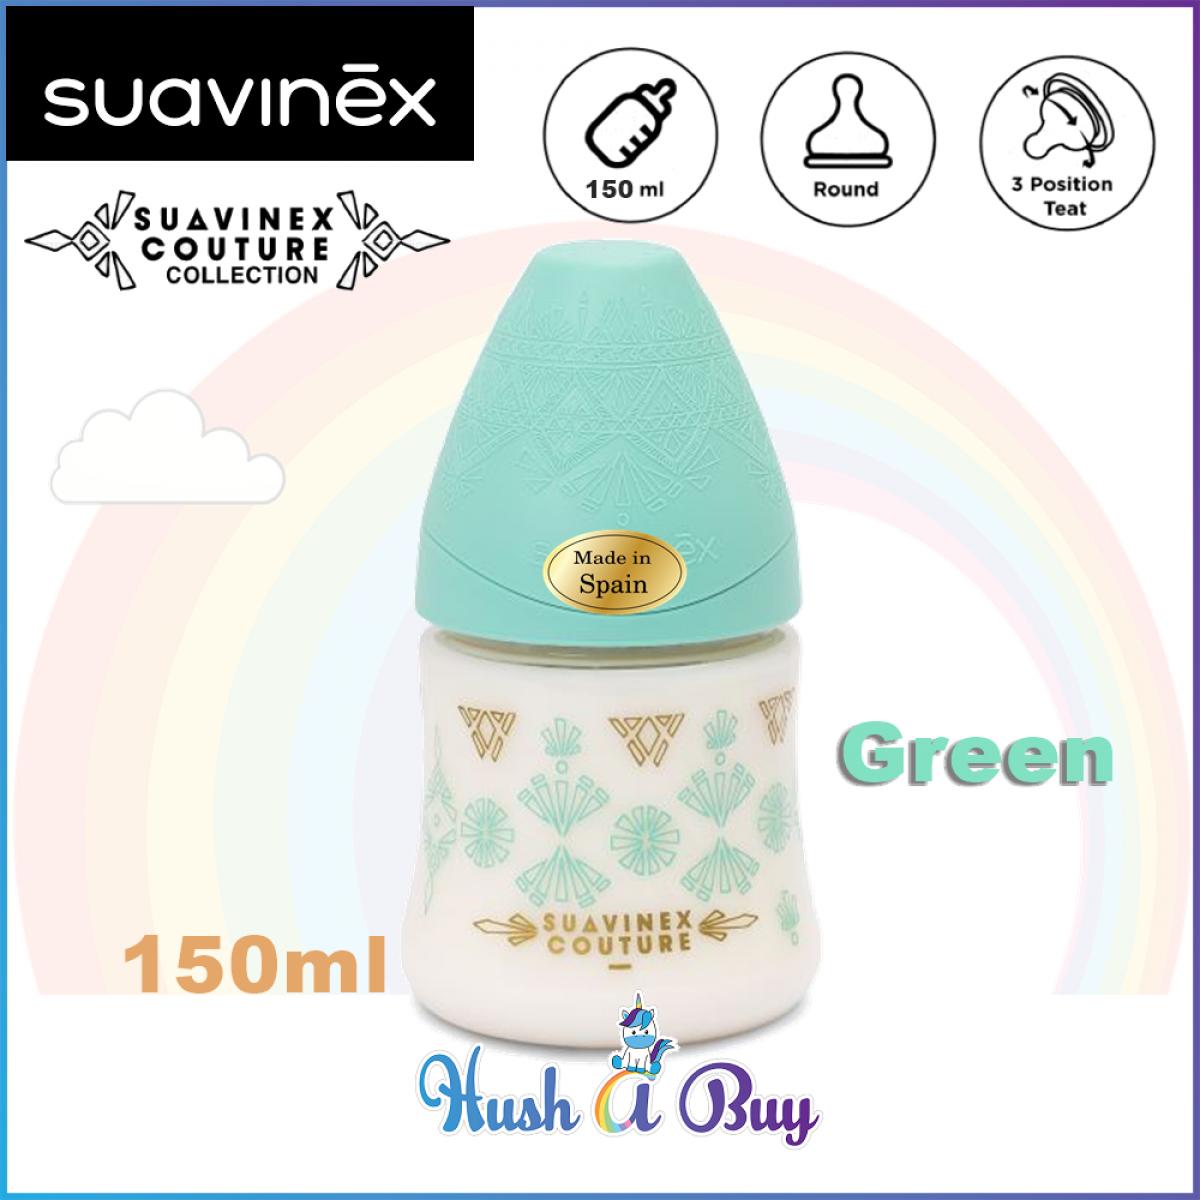 Suavinex Coutour PA Feeding Bottle 0.6M with Slow Flow Round Silicone Teat -150ml